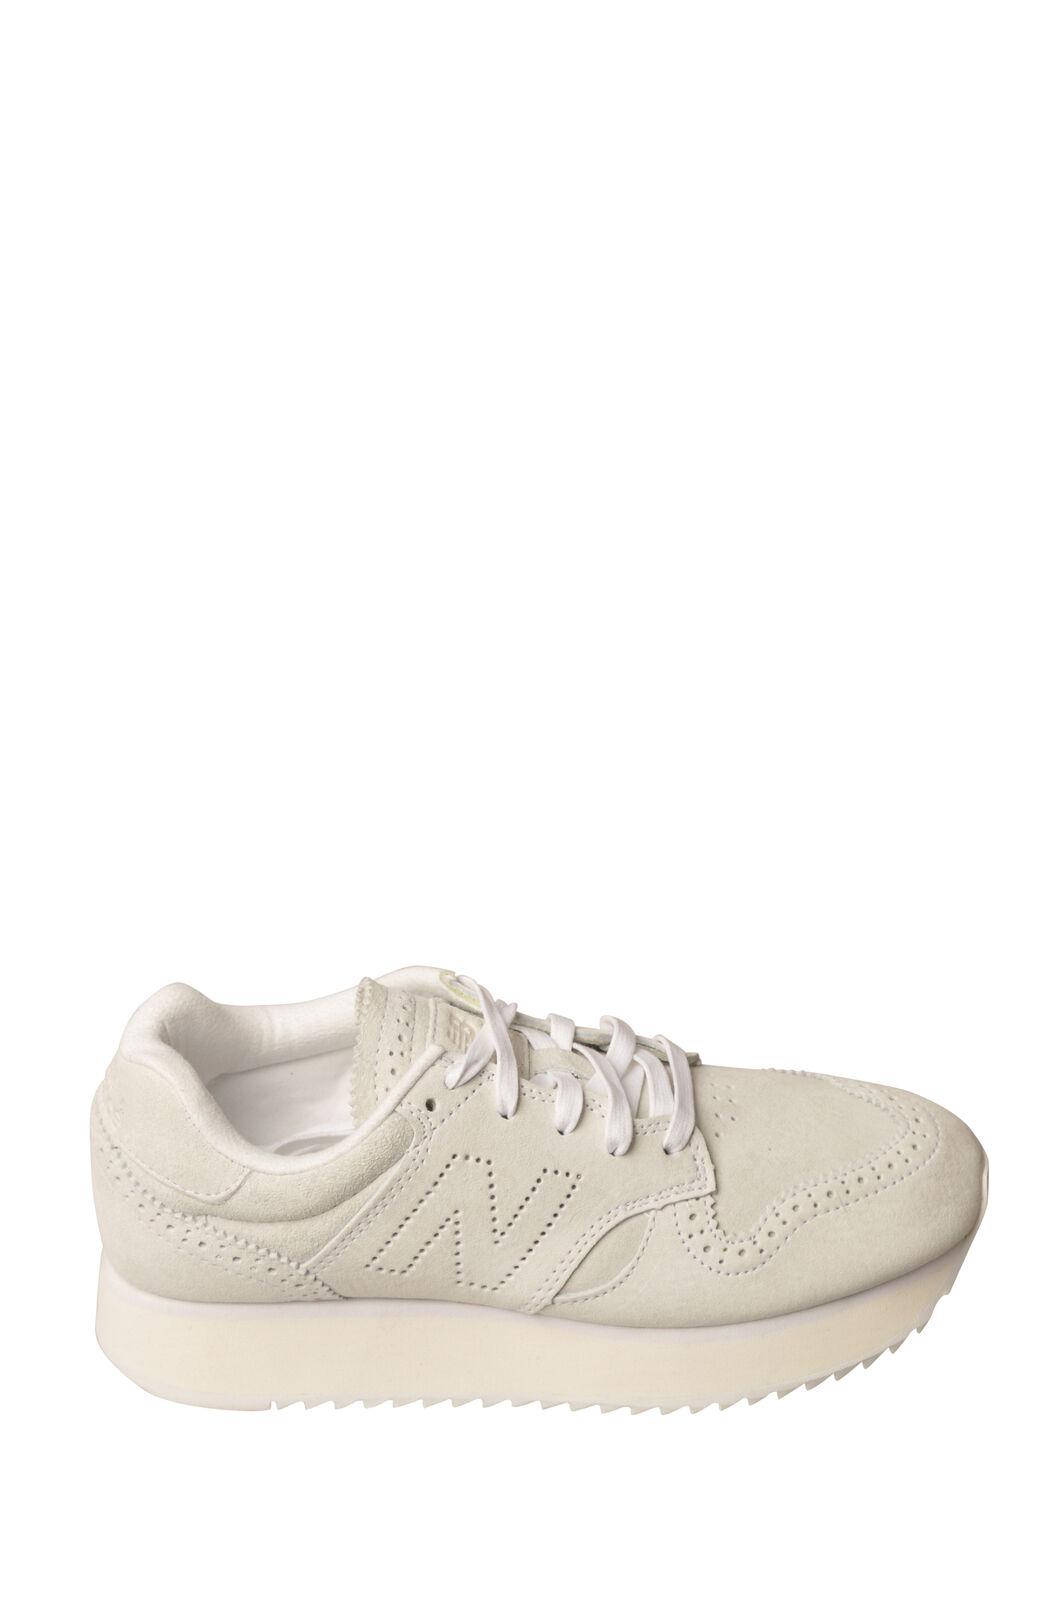 nuovo Balance - sautope-sautope da ginnastica low - donna - bianca - 6302711H191653